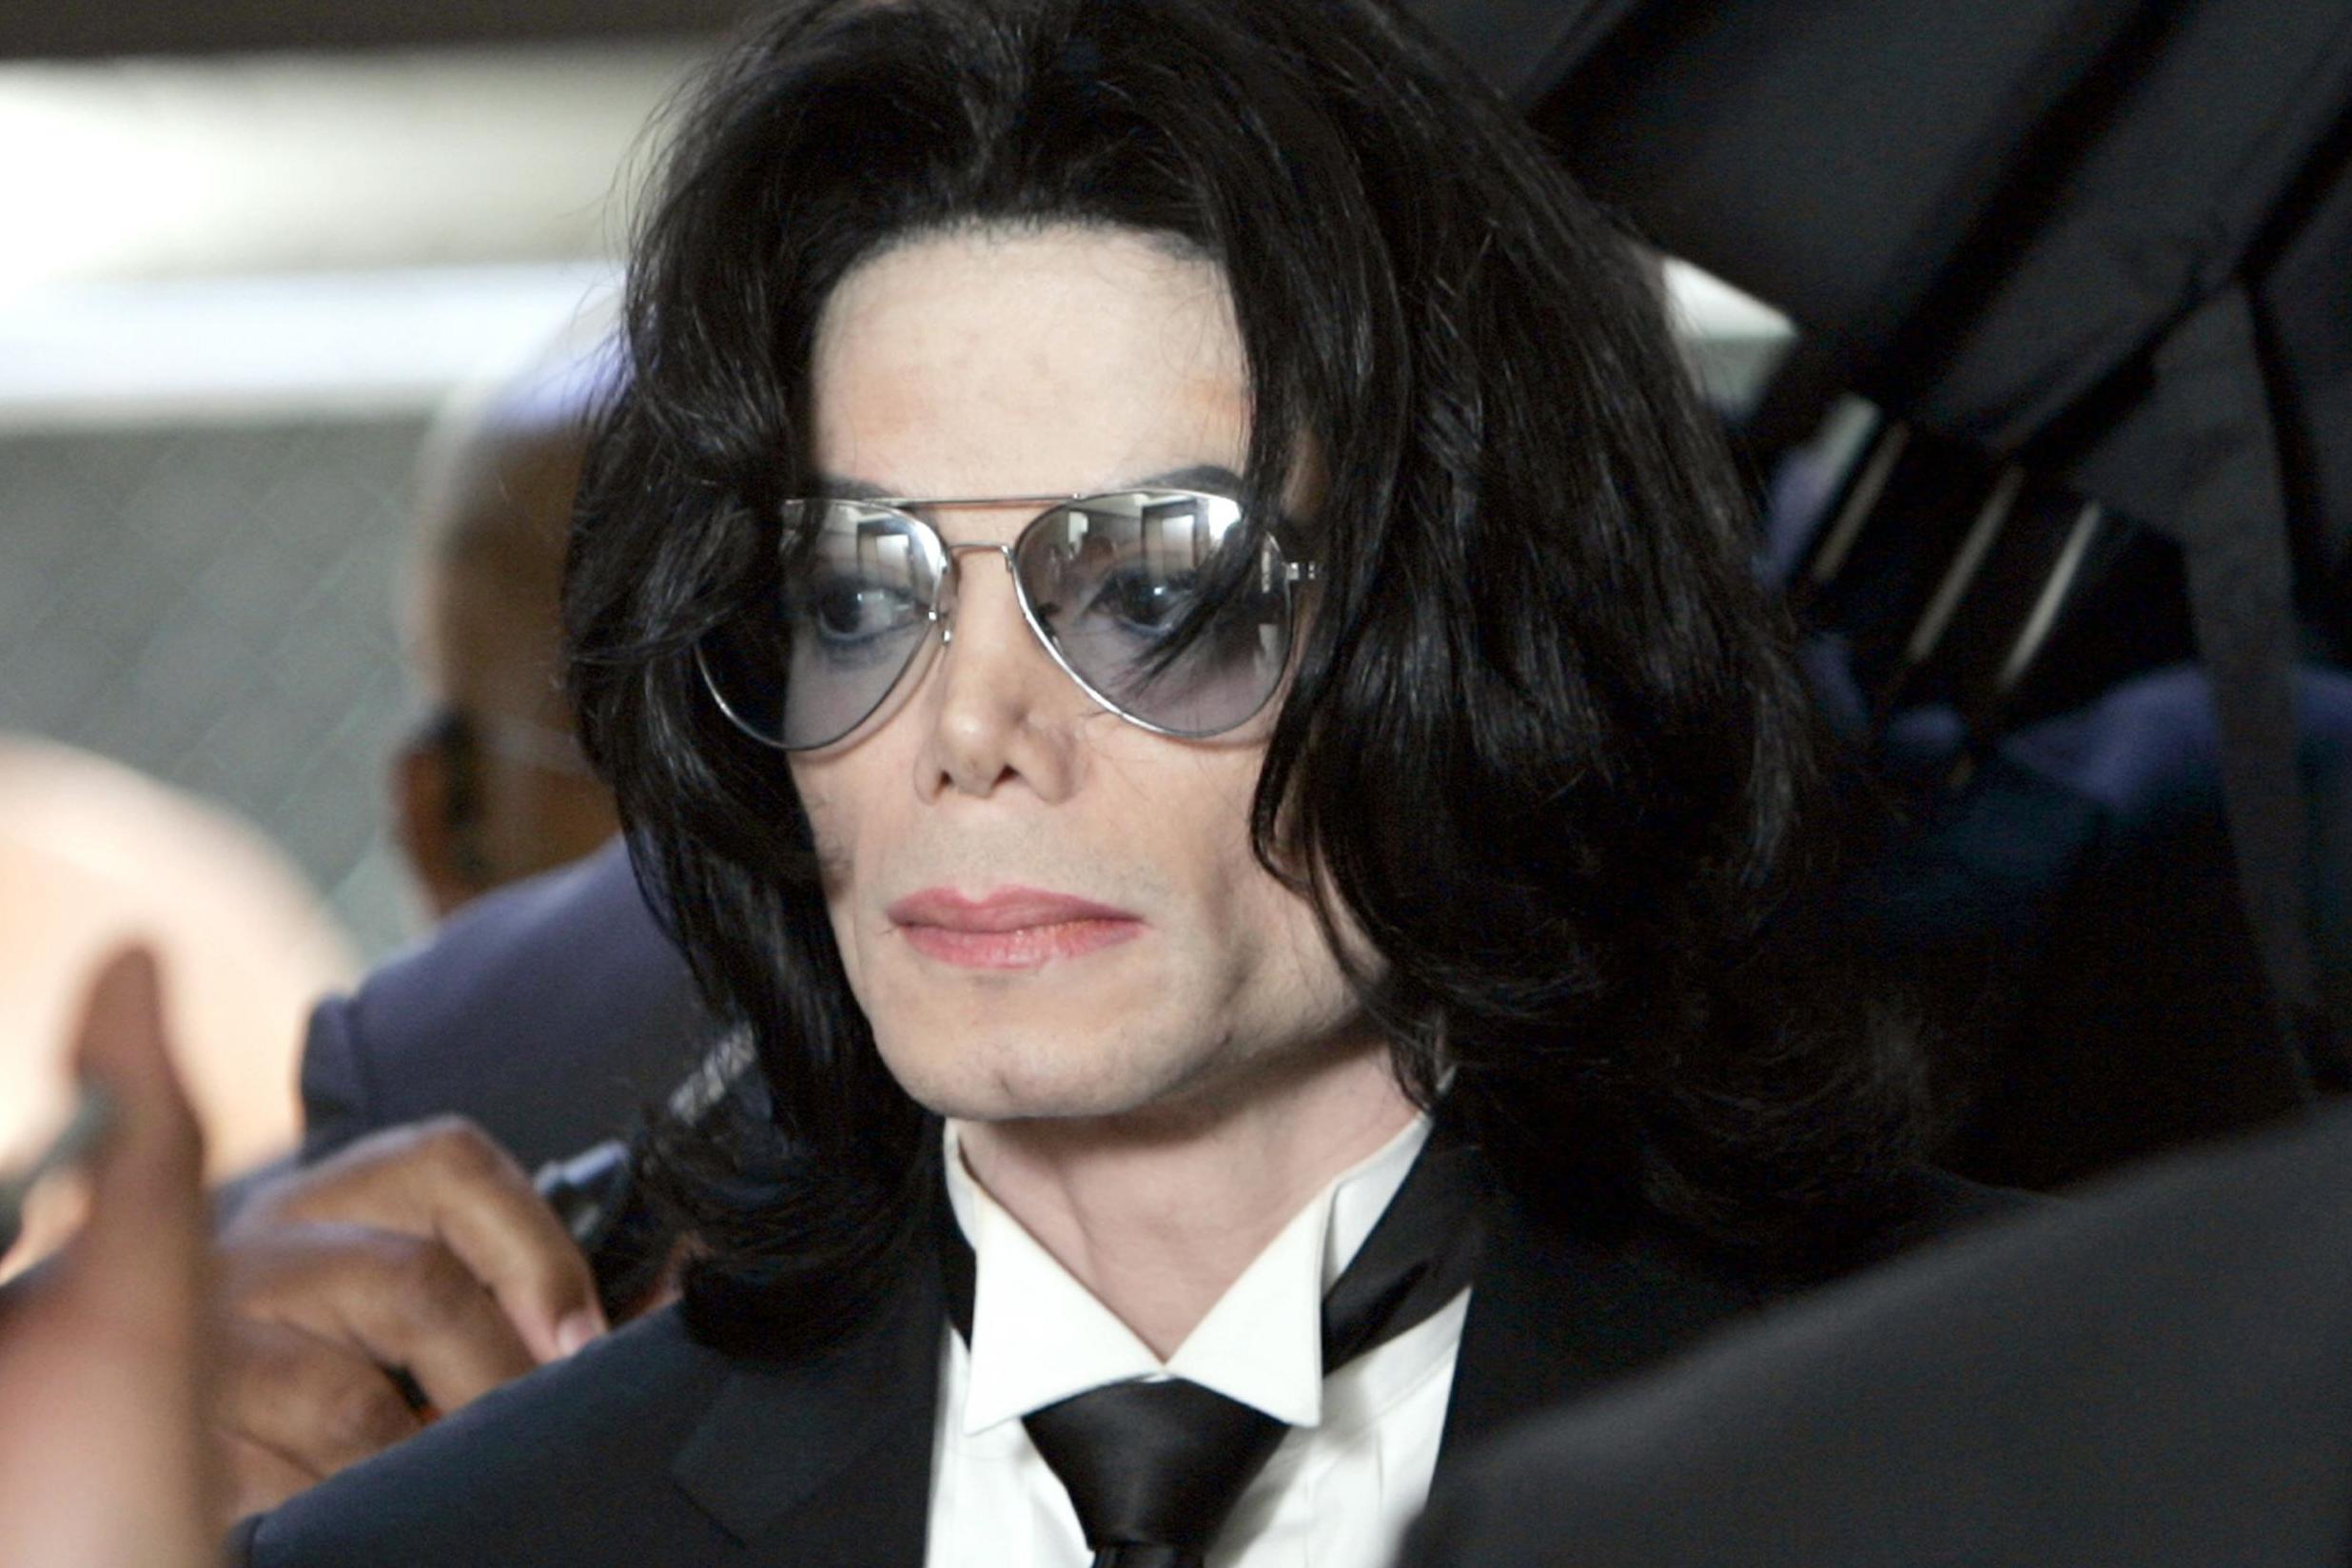 Michael Jackson biopic: Bohemian Rhapsody producer to make film exploring singer's 'complex life'